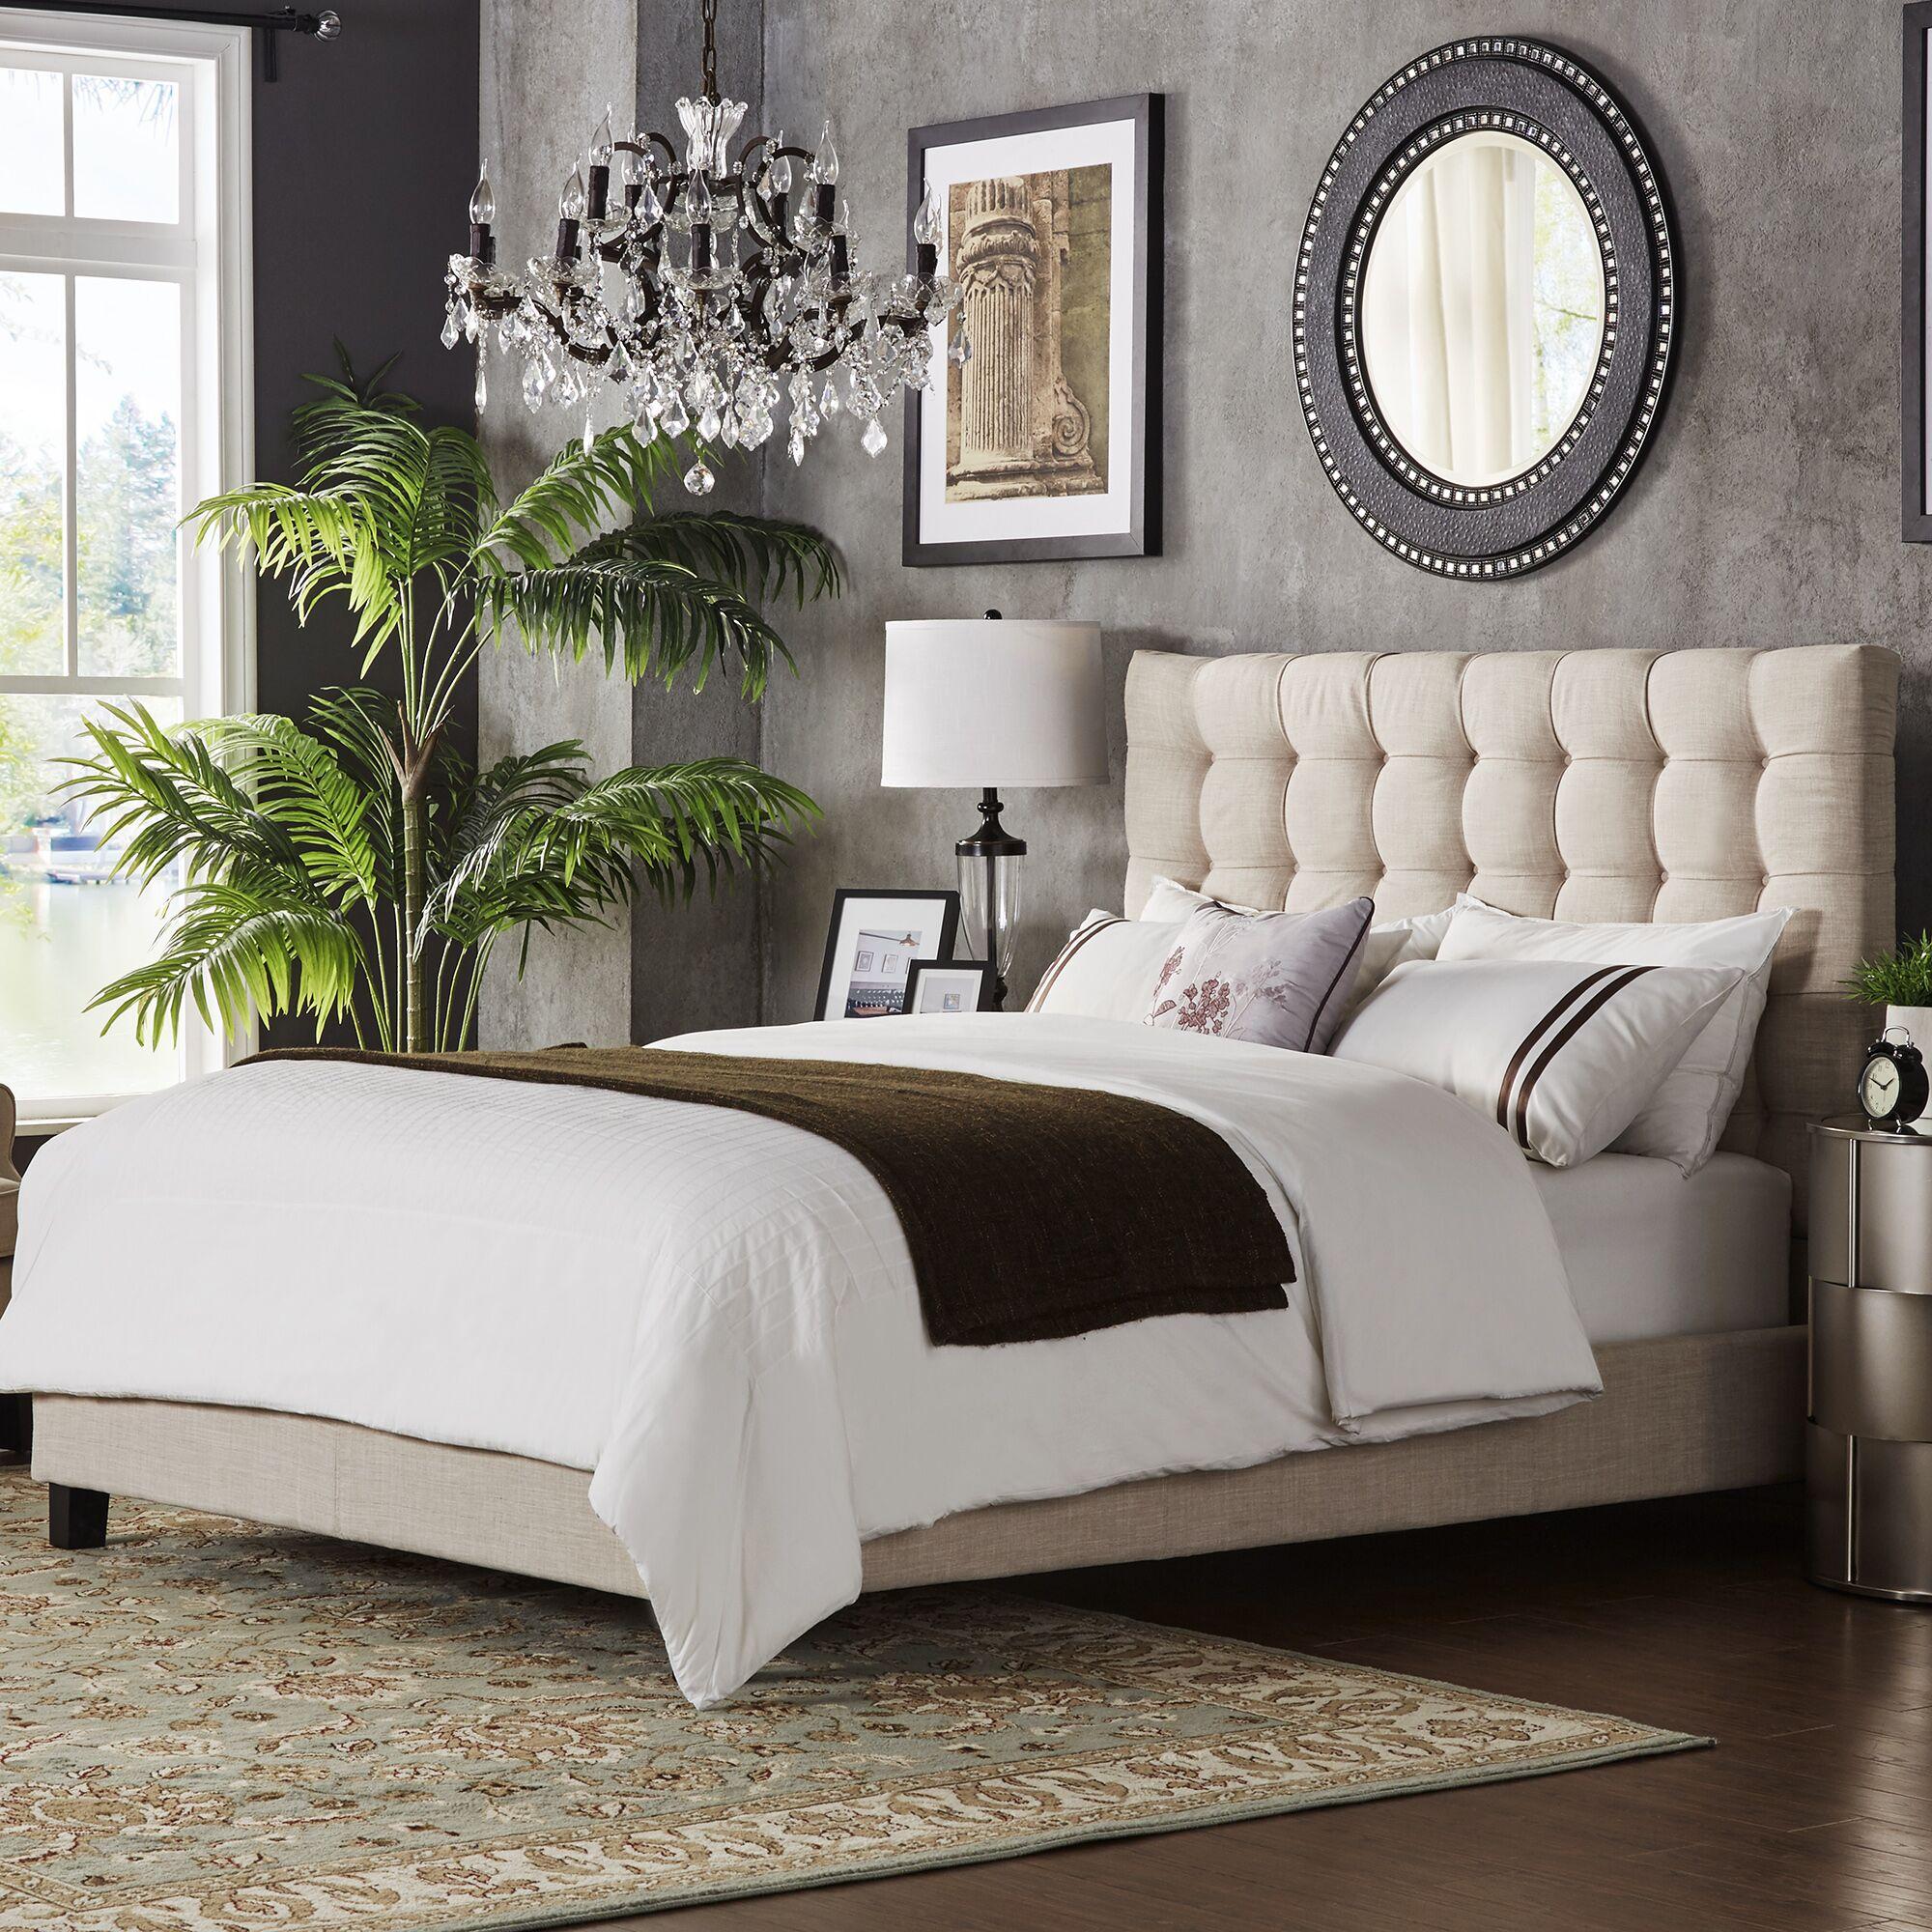 Bourdon Upholstered Panel Bed Upholstery Color: Beige, Size: Full